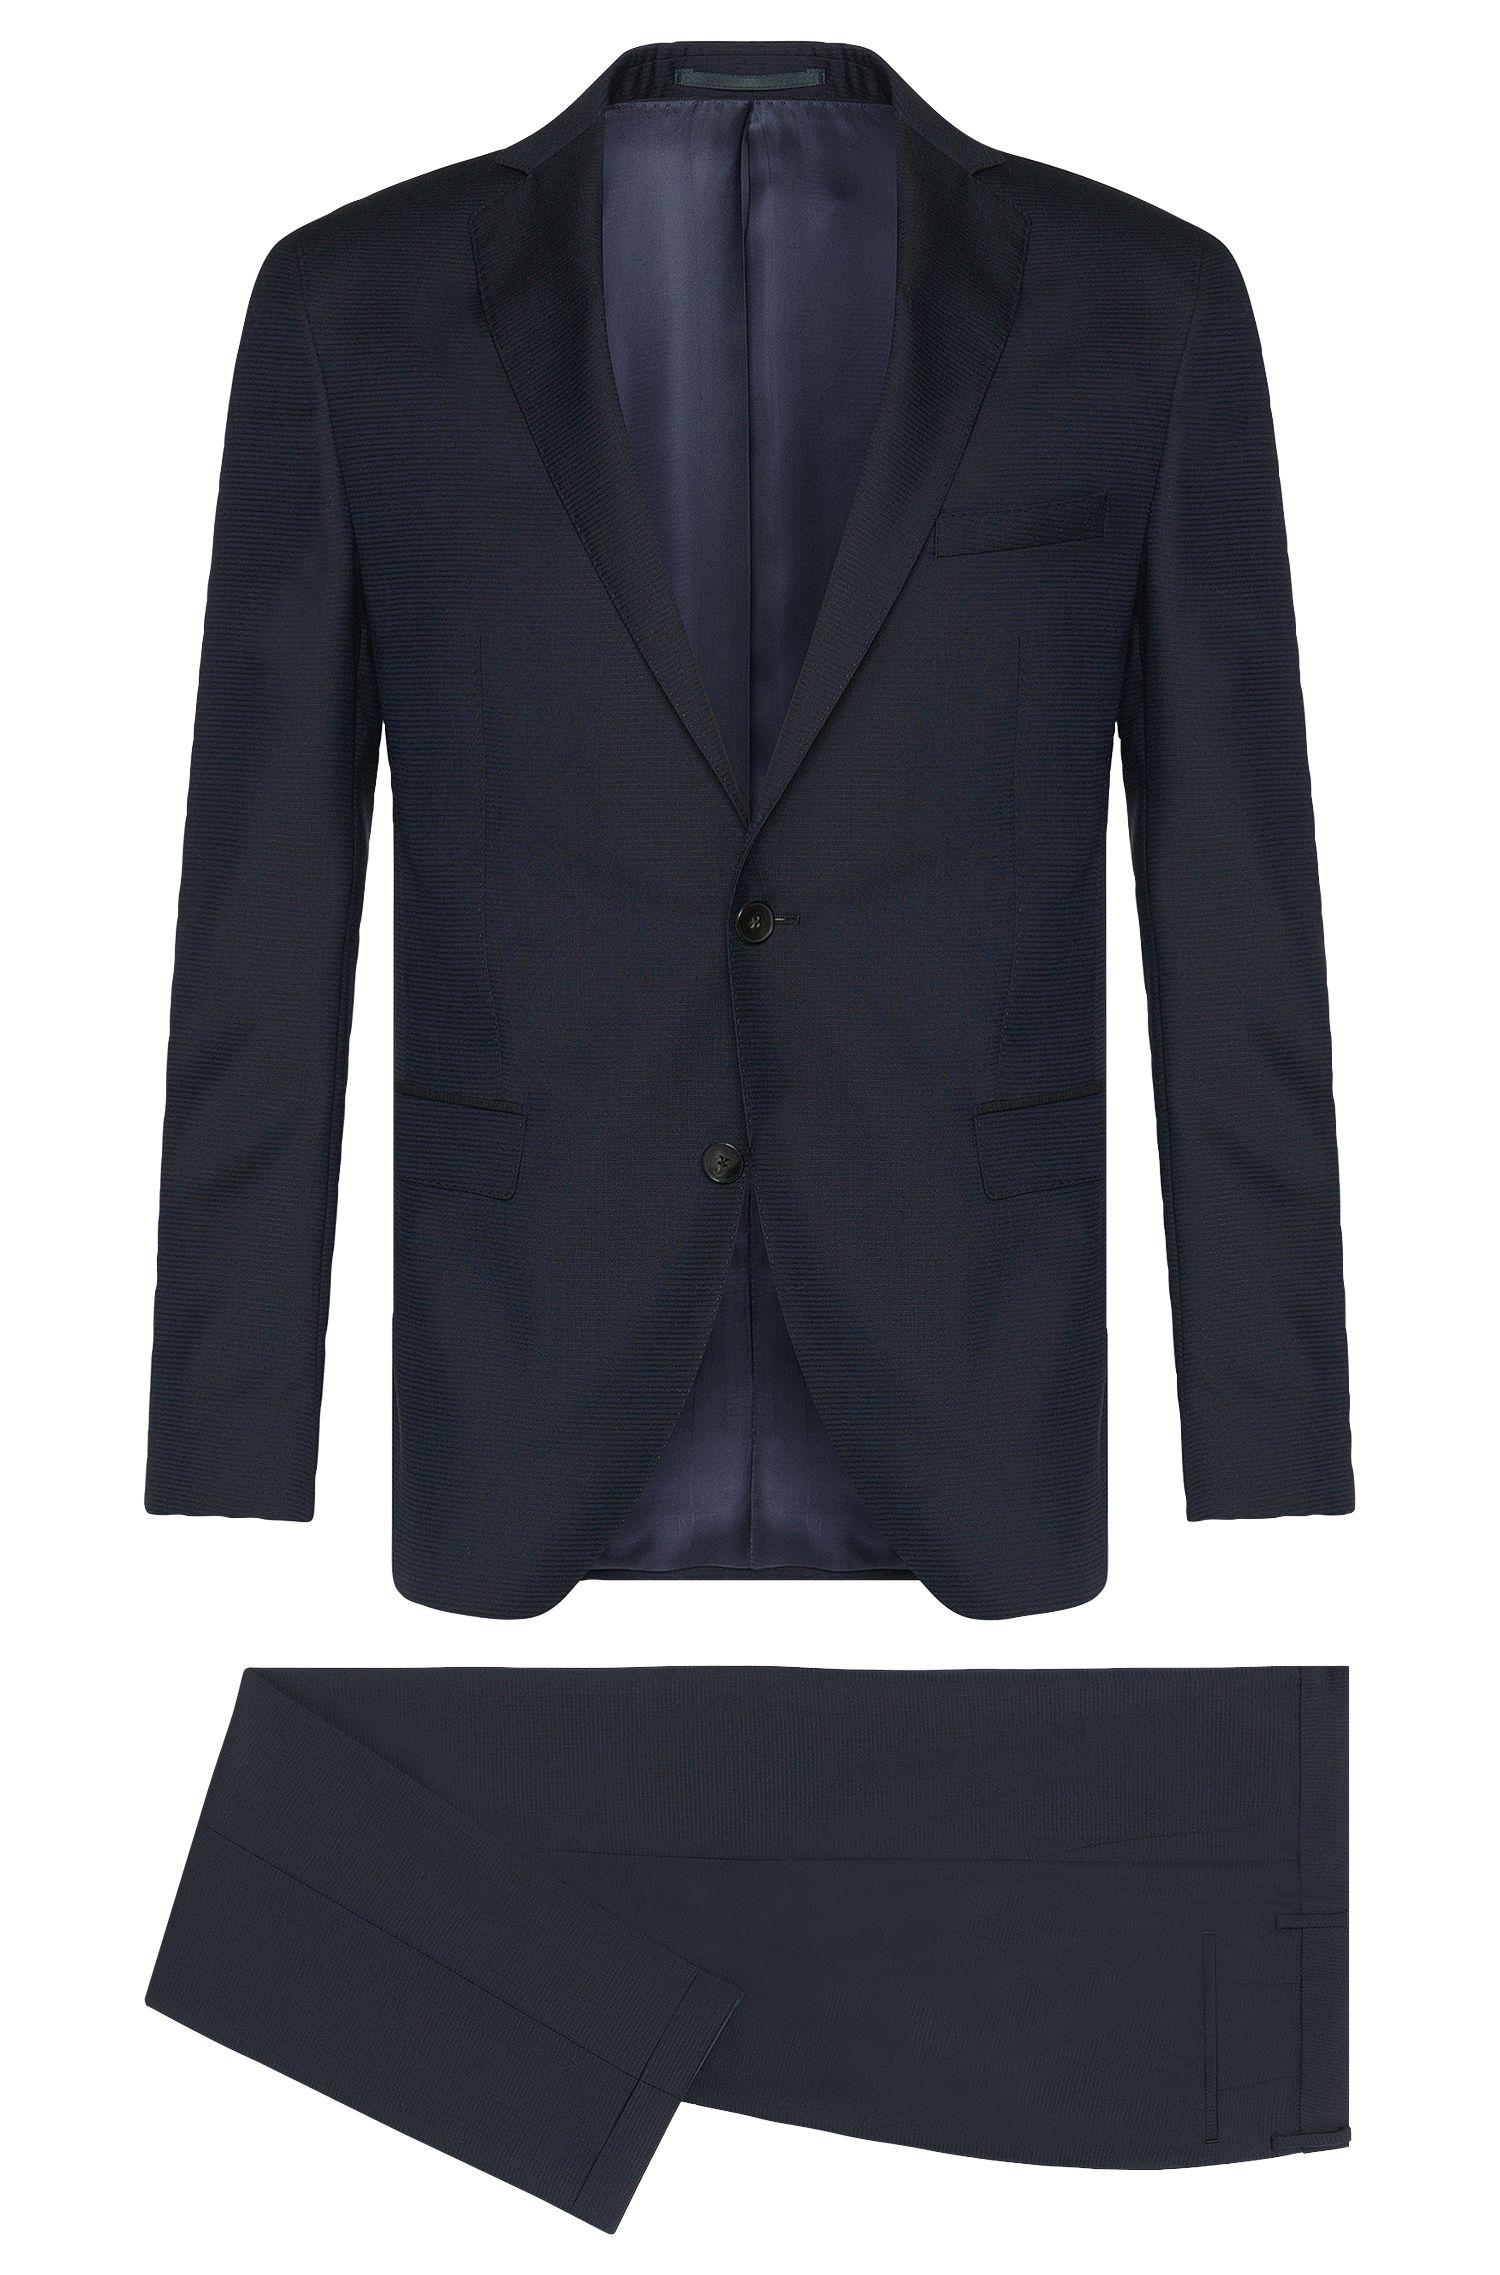 'Reyno/Wave' | Extra-Slim Fit, Stretch Virgin Wool Textured Stripe Suit